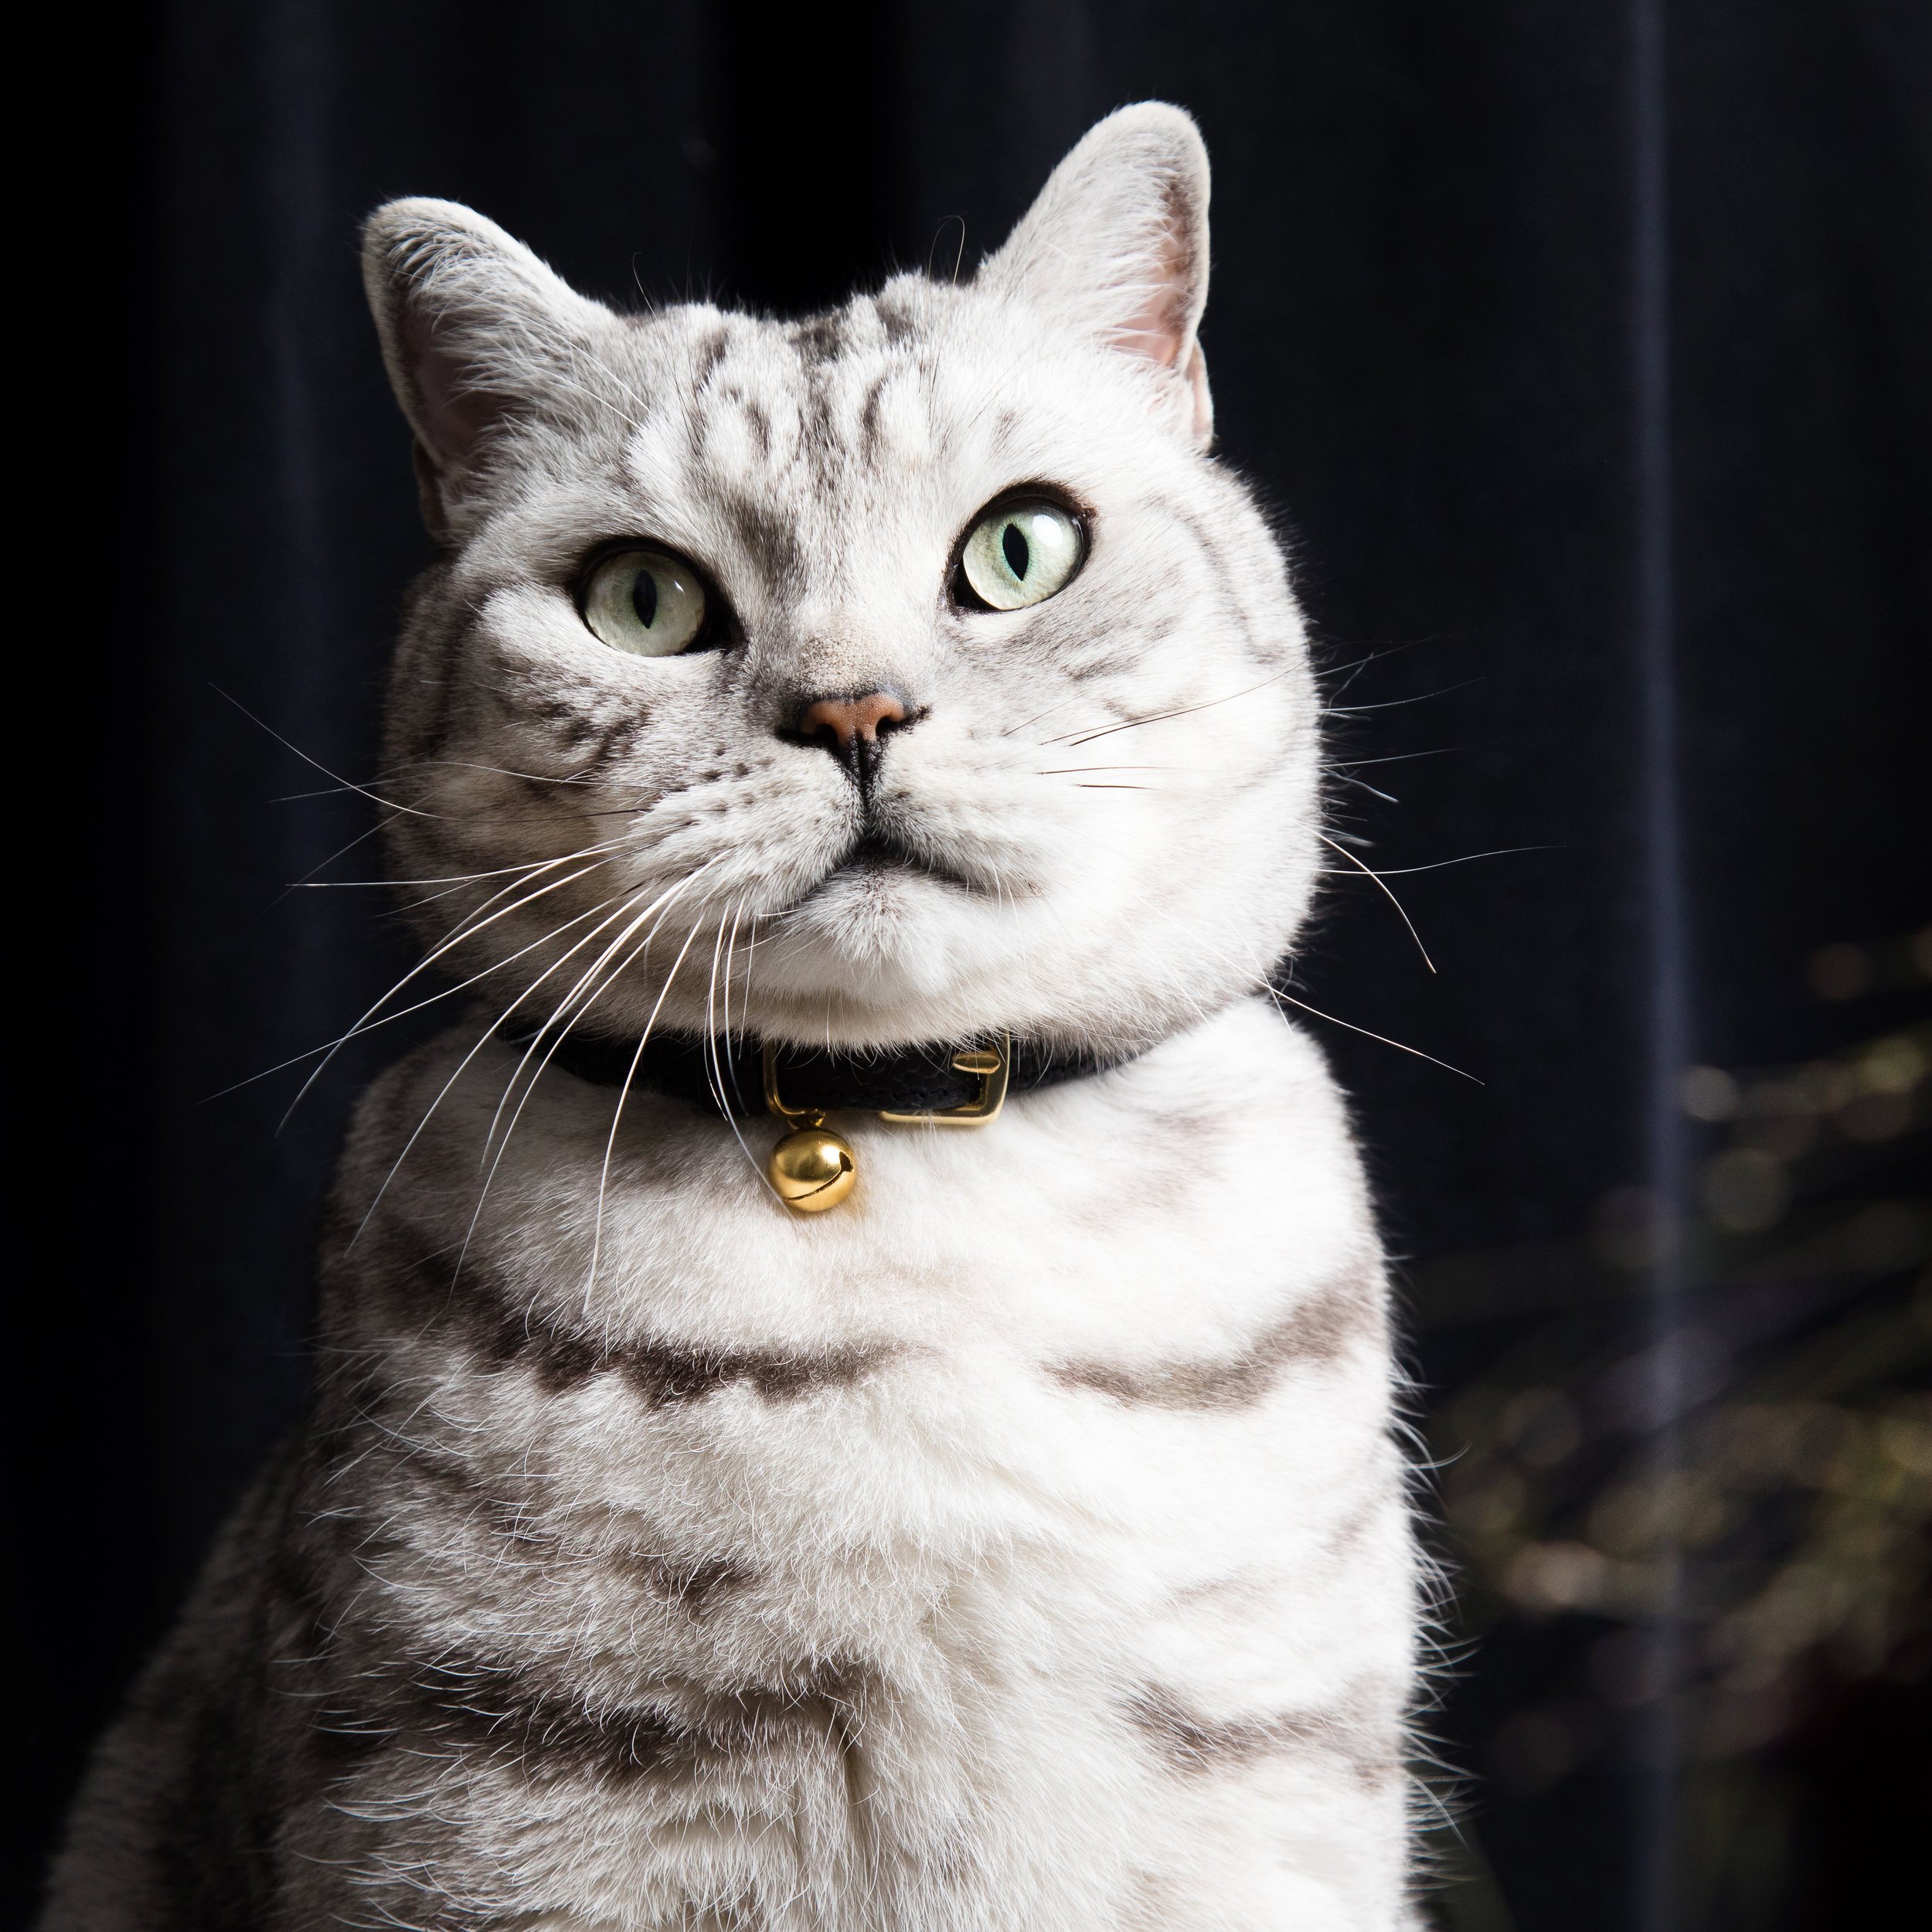 leather safety collars cat collar luxury designer